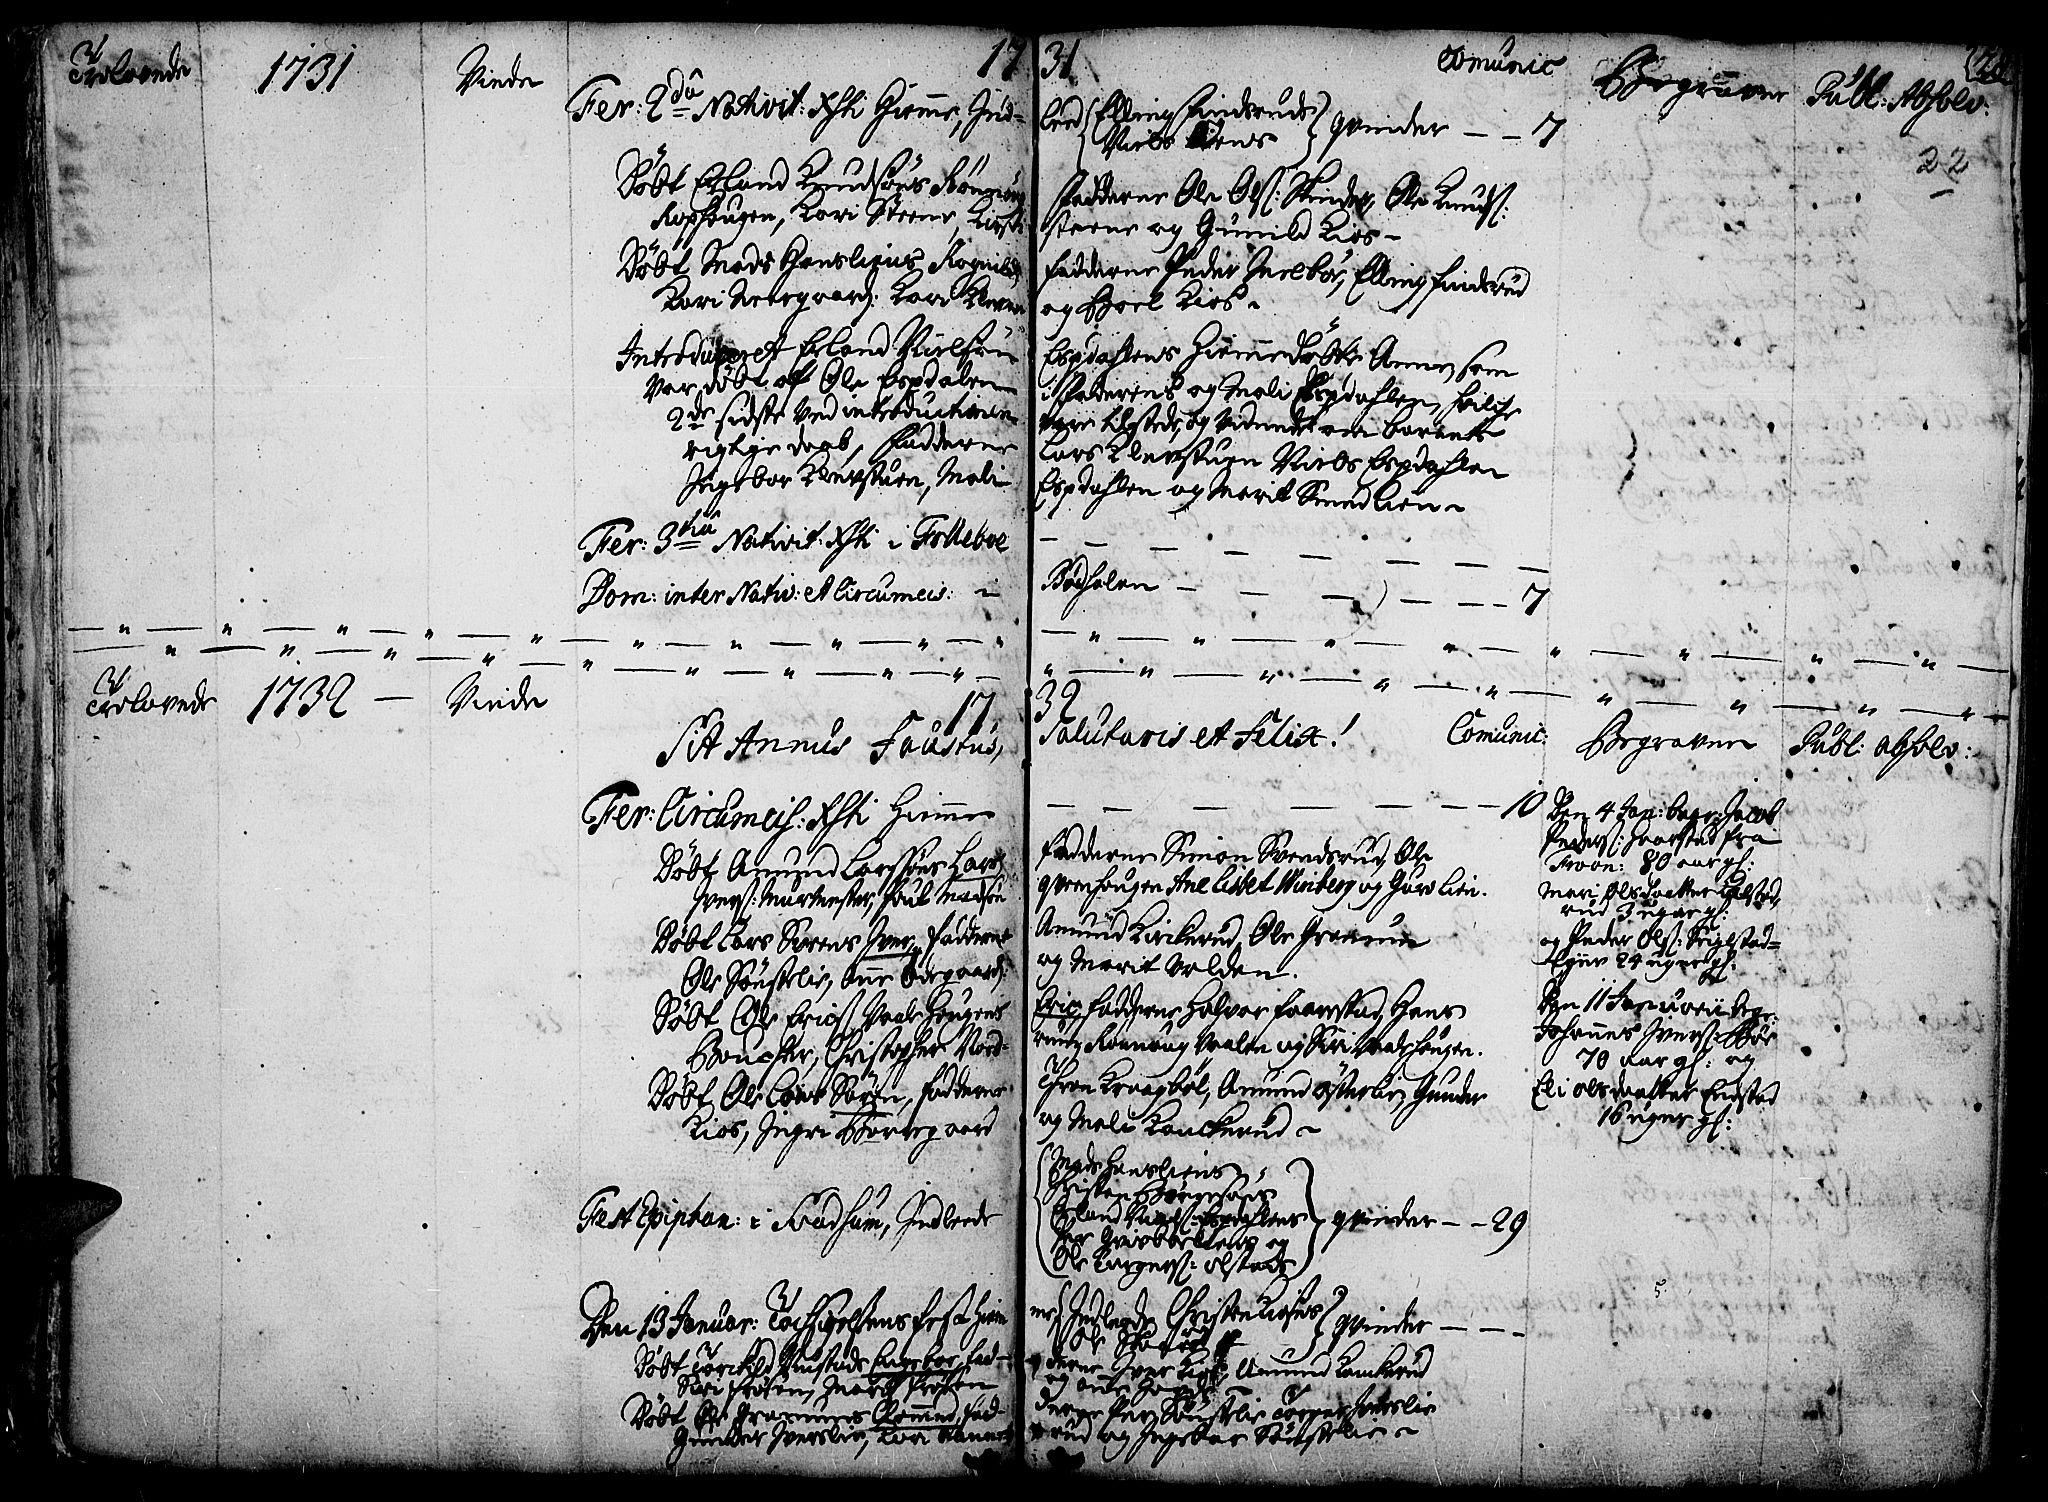 SAH, Gausdal prestekontor, Ministerialbok nr. 2, 1729-1757, s. 22